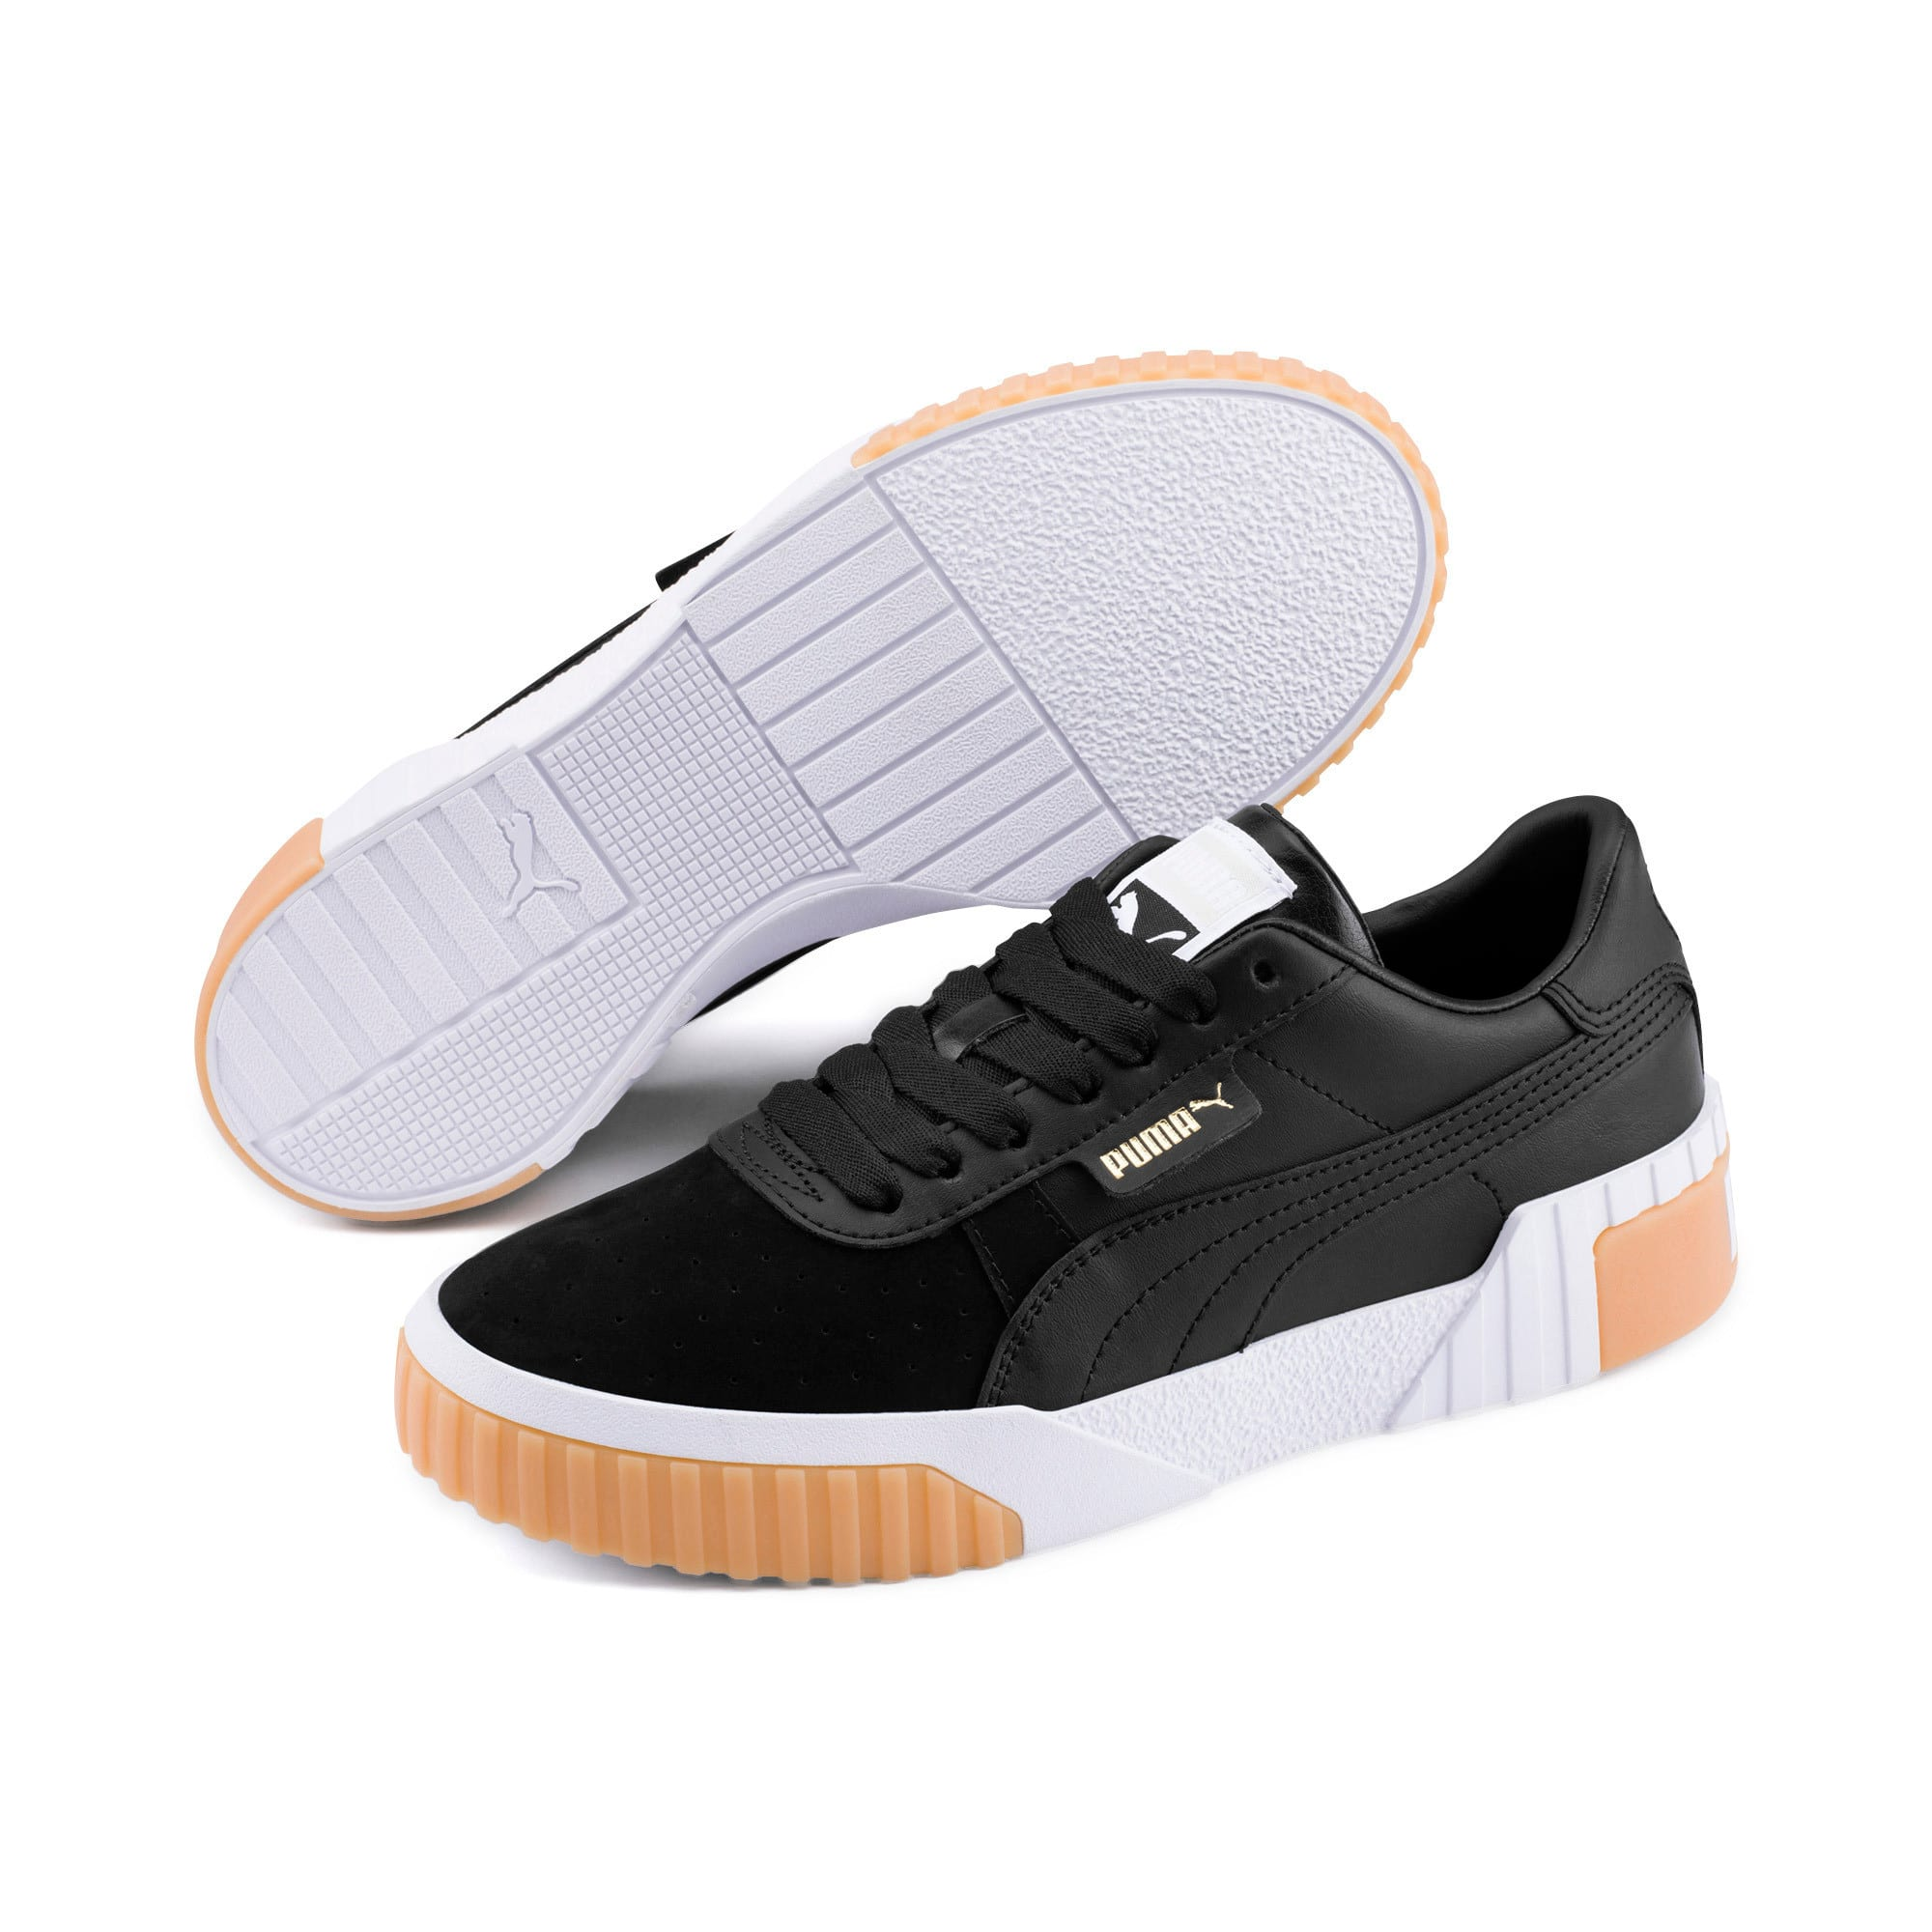 Thumbnail 2 of Cali Exotic Women's Sneakers, Puma Black-Puma Black, medium